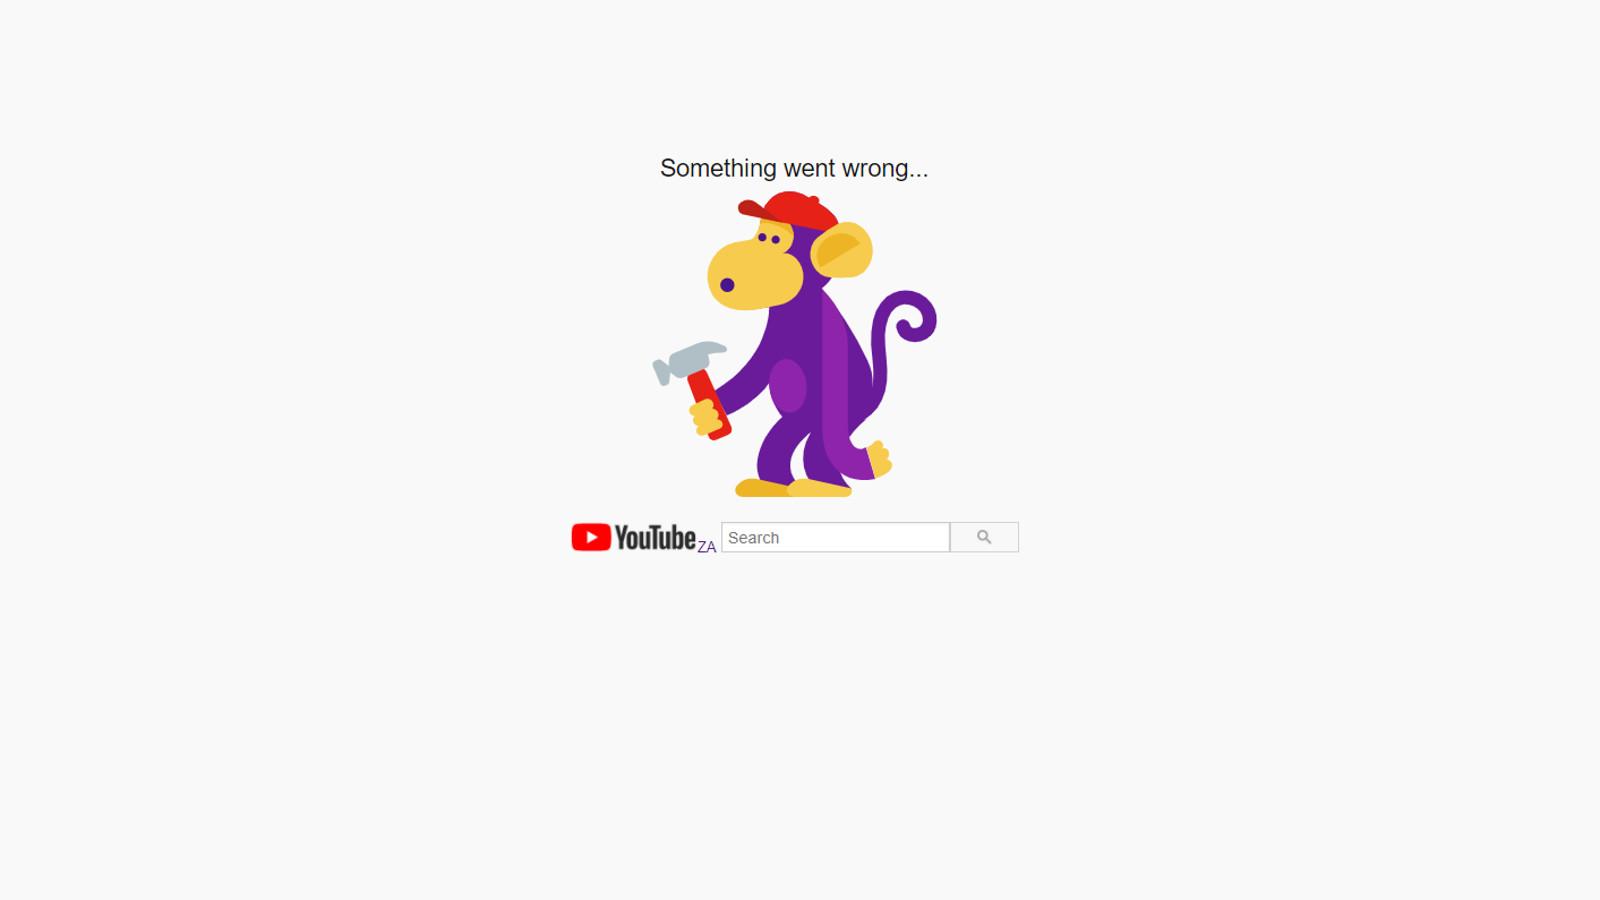 youtube offline december 2020